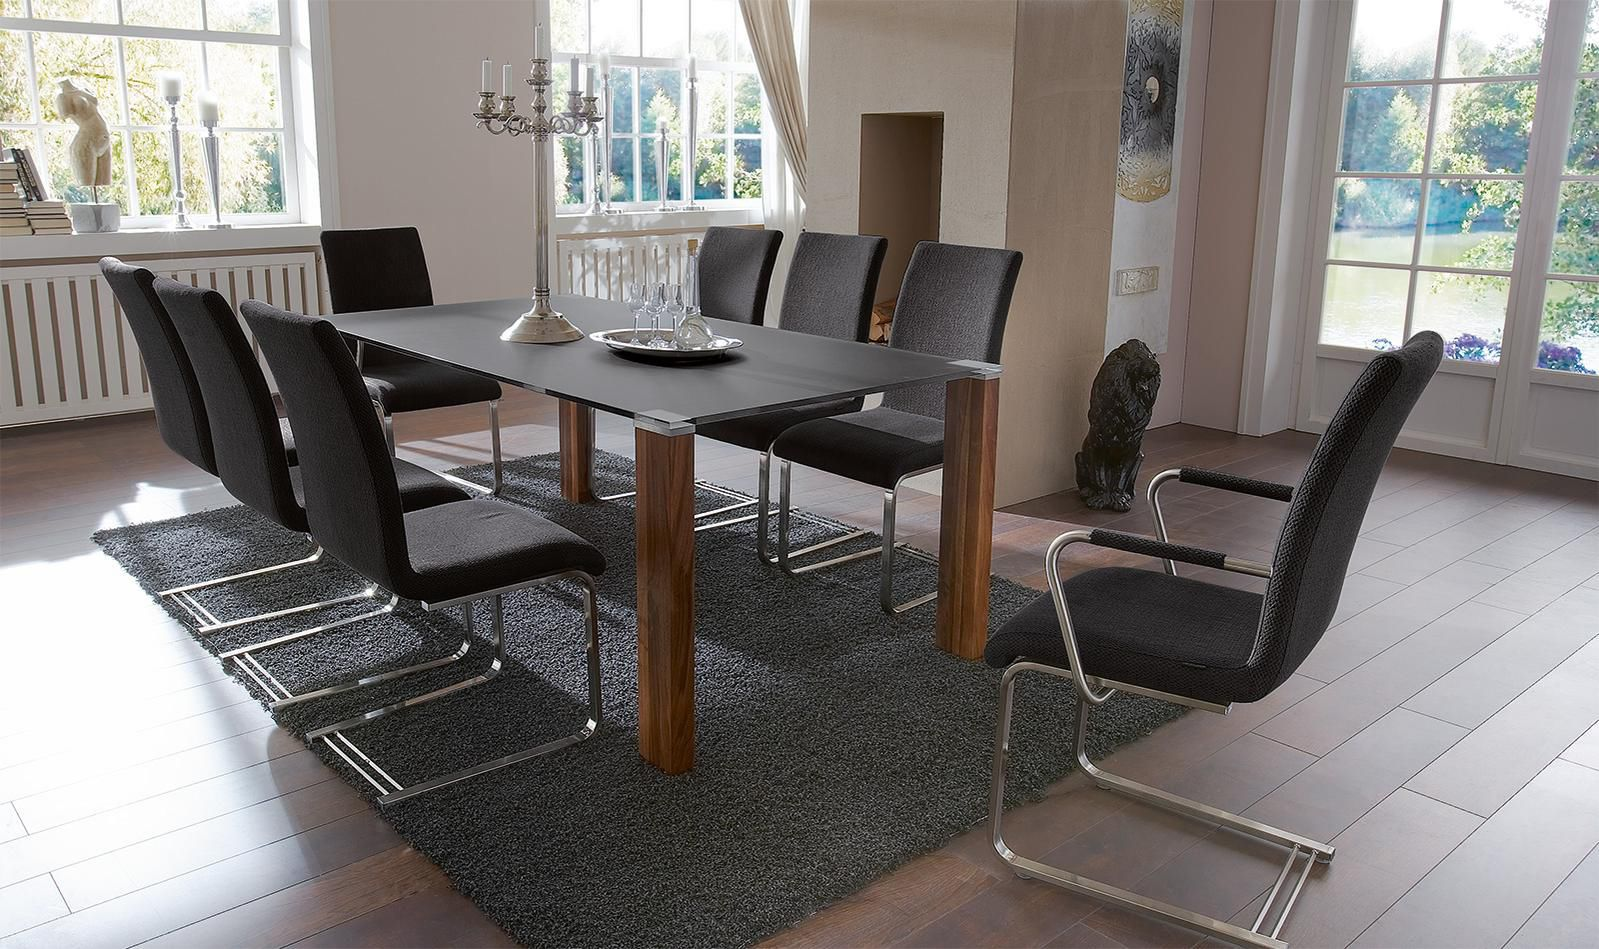 Moderner Stuhl Polster Mit Uberhang Stoff Daniella